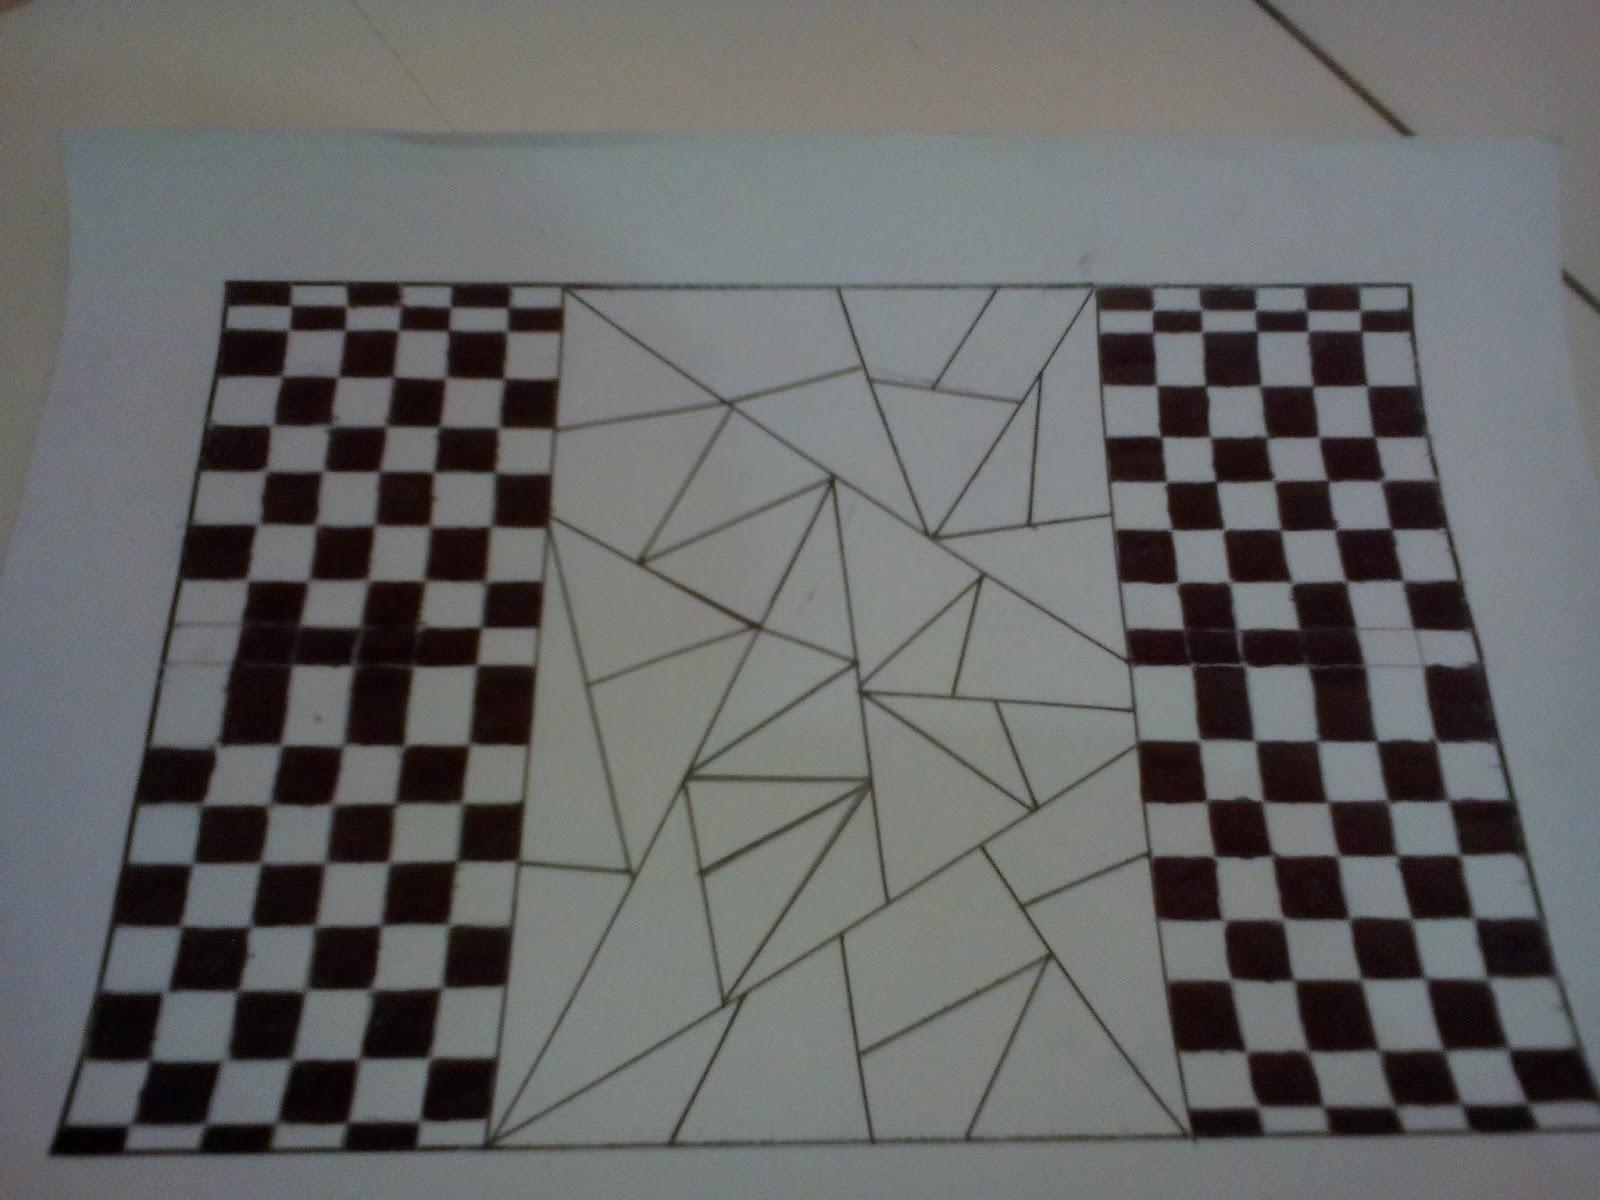 Setelah kita menghitamkan bentuk persegi atau persegi panjang sekarang kita kan mewarnai bentuk yang ada pada bagian tengah tersebut seperti gambar